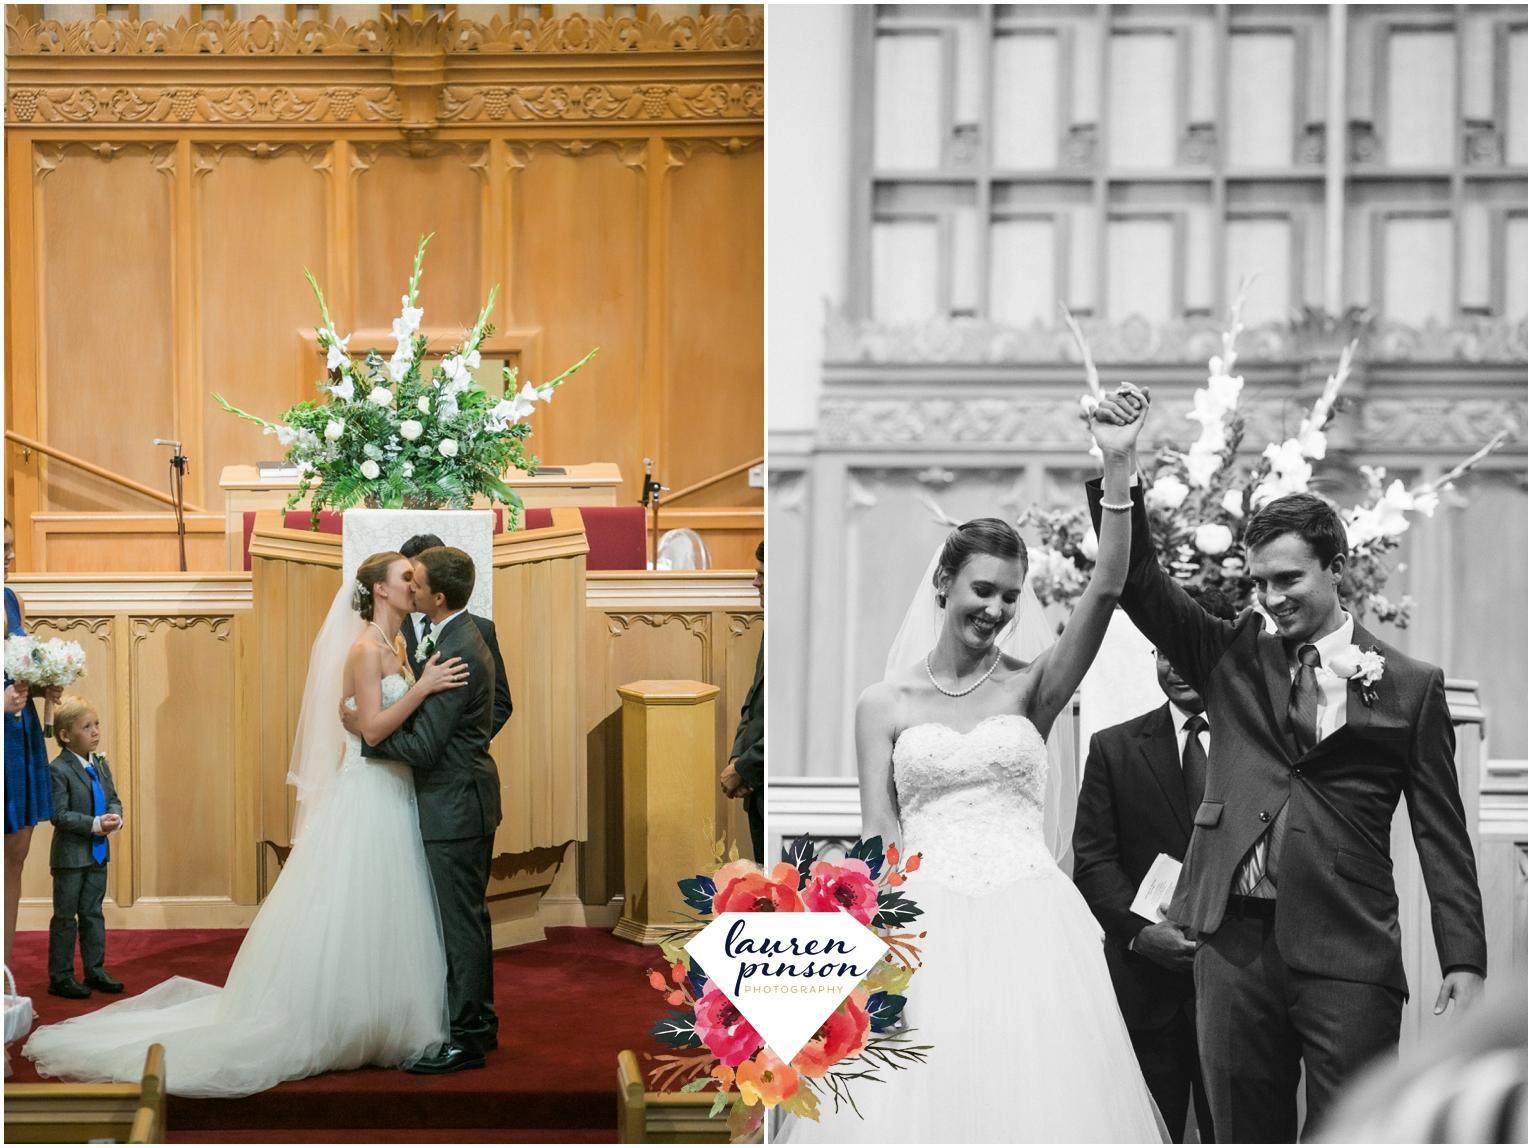 wichita-falls-wedding-photography-at-fain-presbyterian-church-and-the-wellington-timeless-classic-modern-photographer_1138.jpg